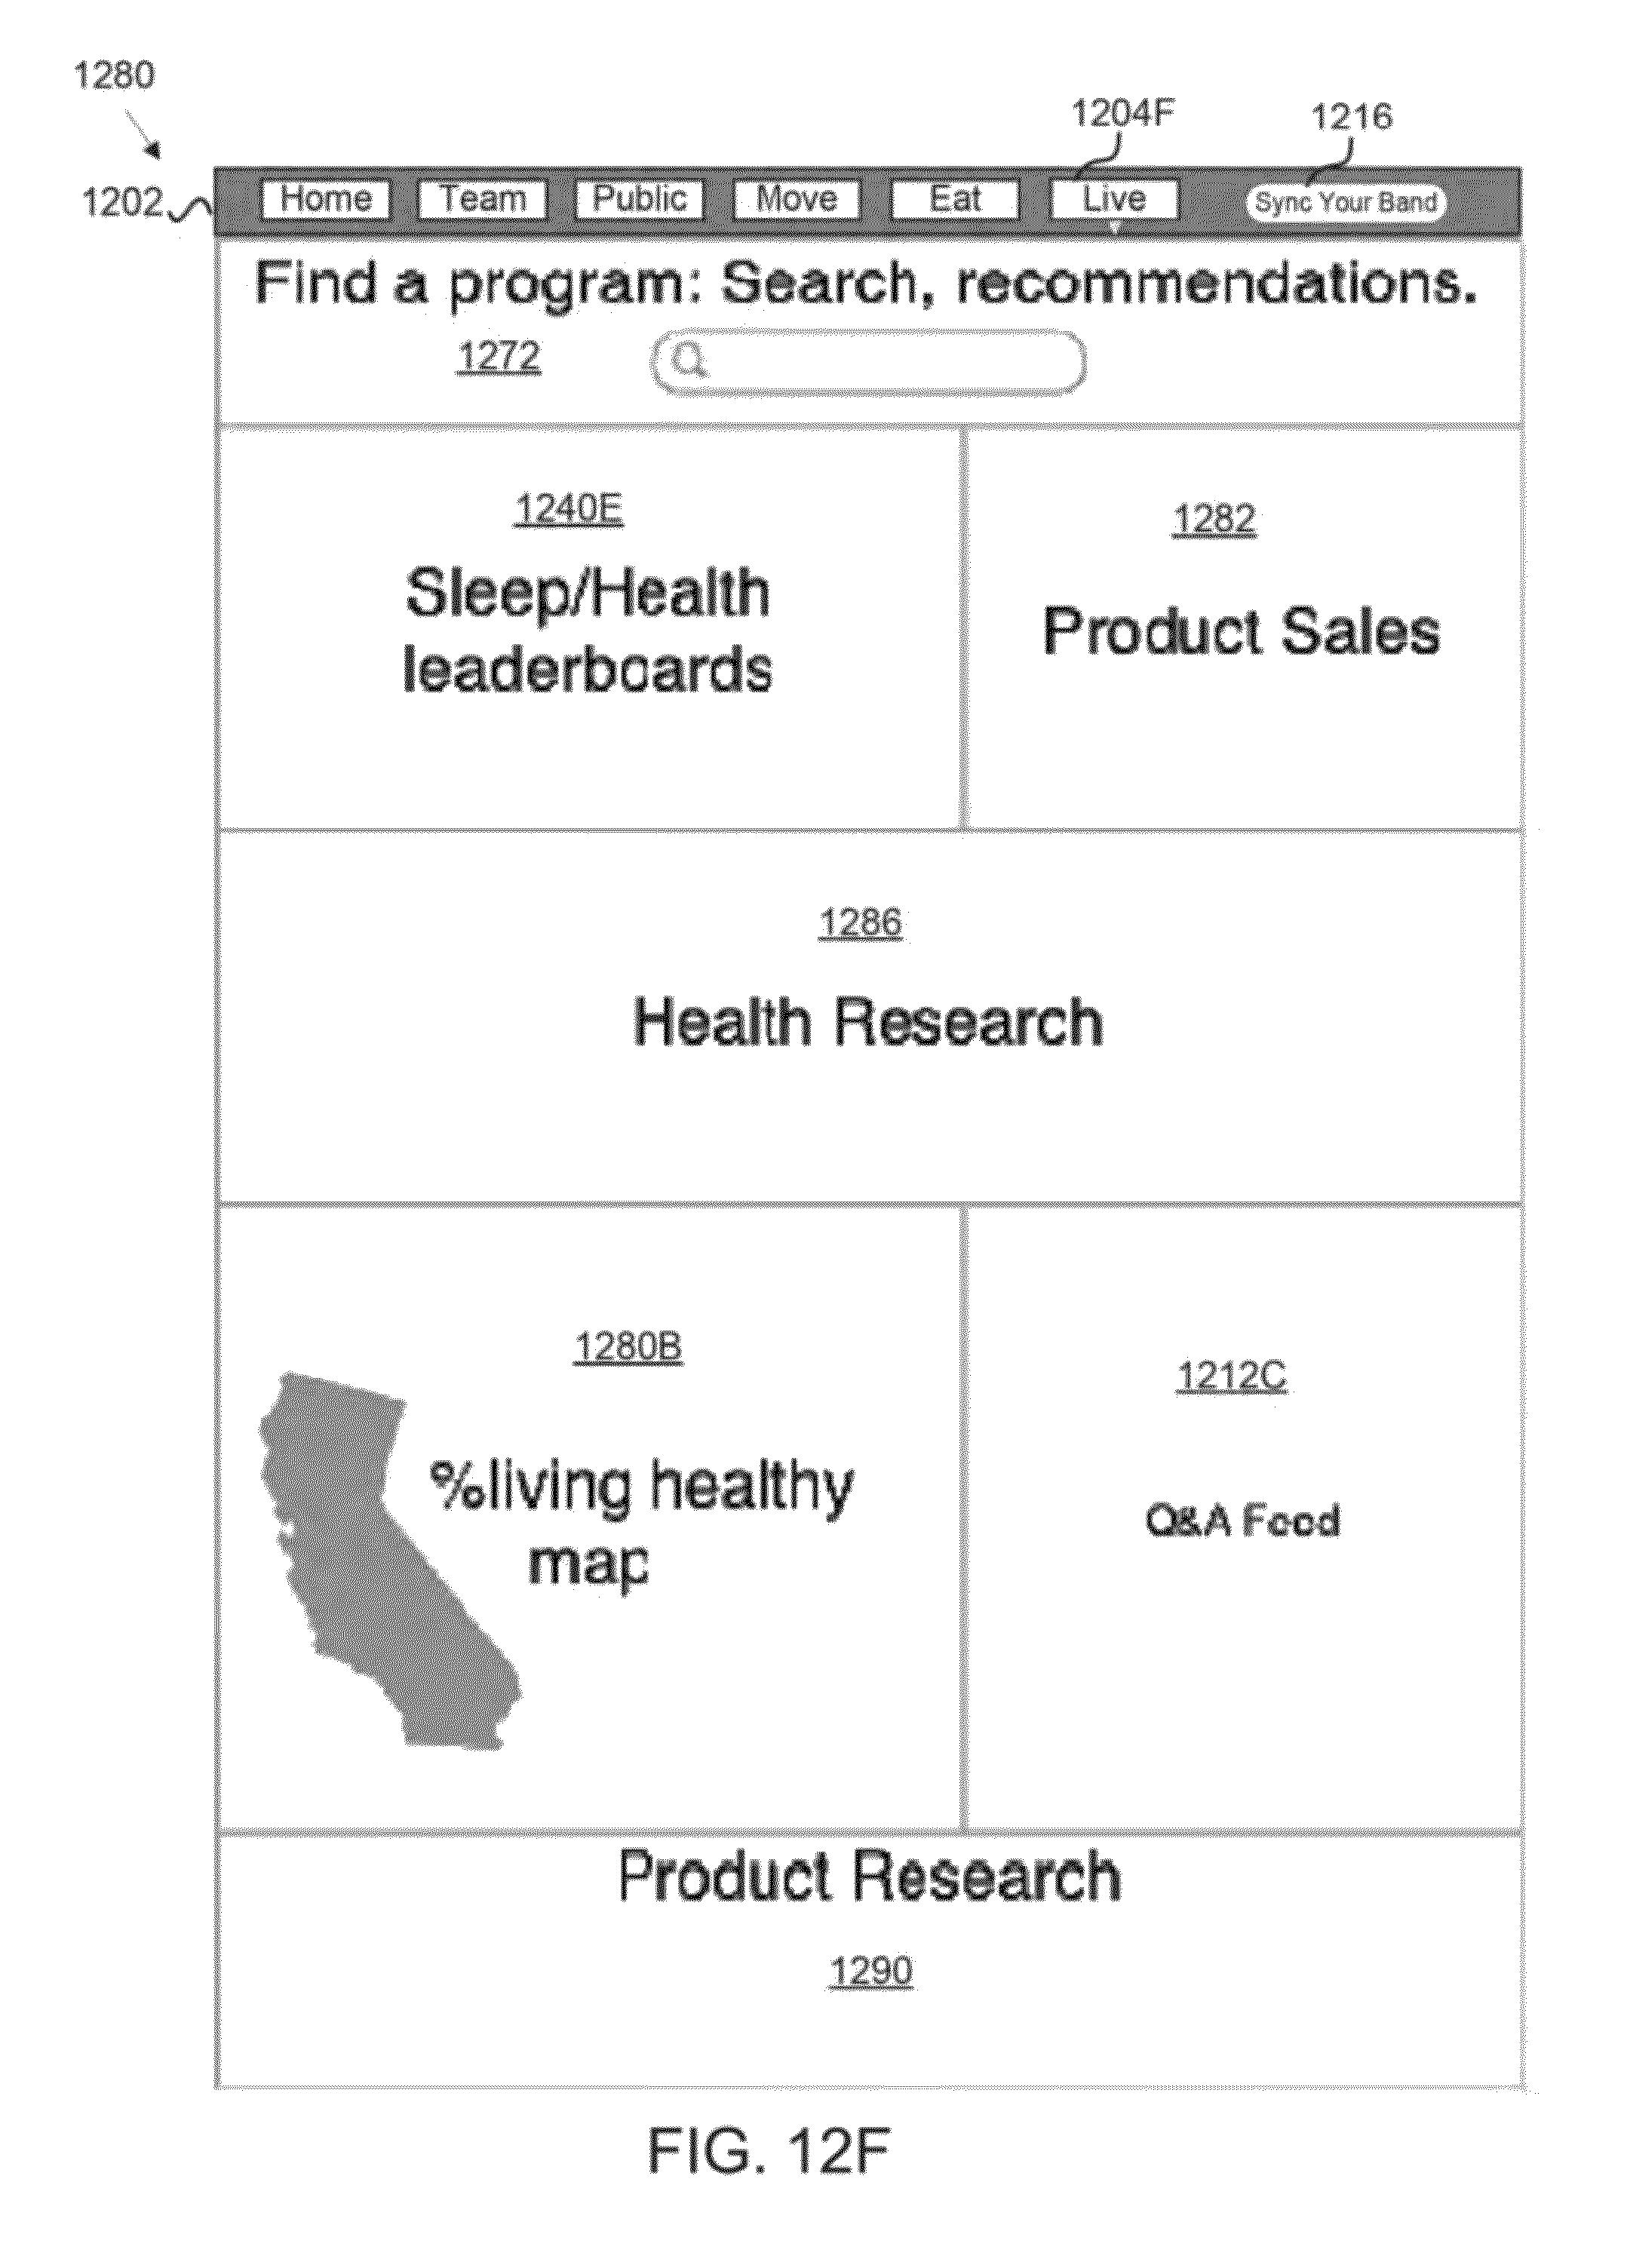 Patent US 8,446,275 B2